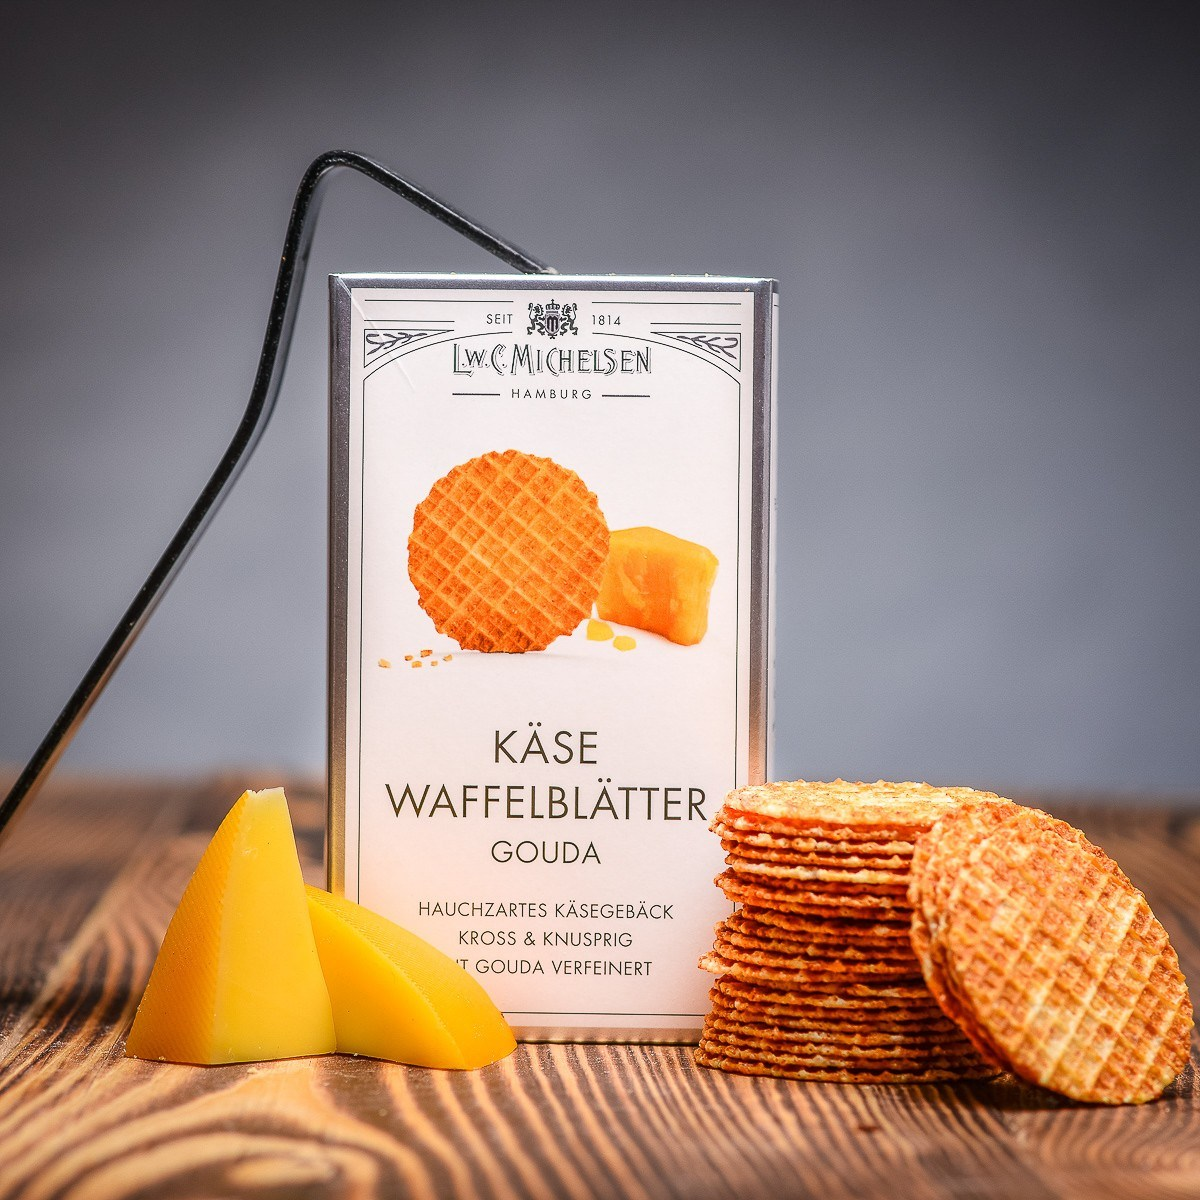 kase waffelblatter gouda 100g syrove vafle.jpg